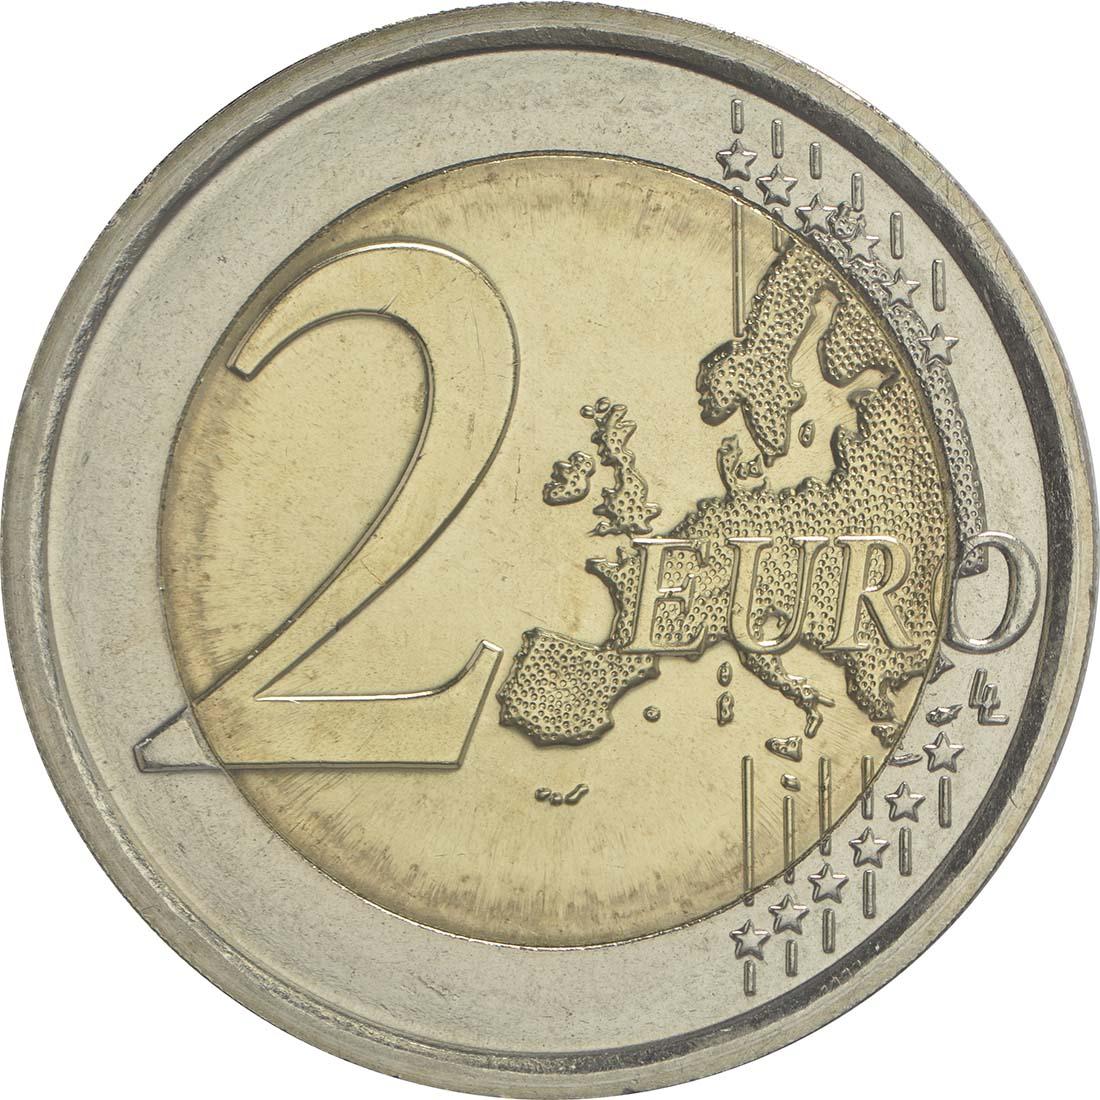 Bild der Vorderseite :Italien - 2 Euro Donatello Bardi  2016 bfr